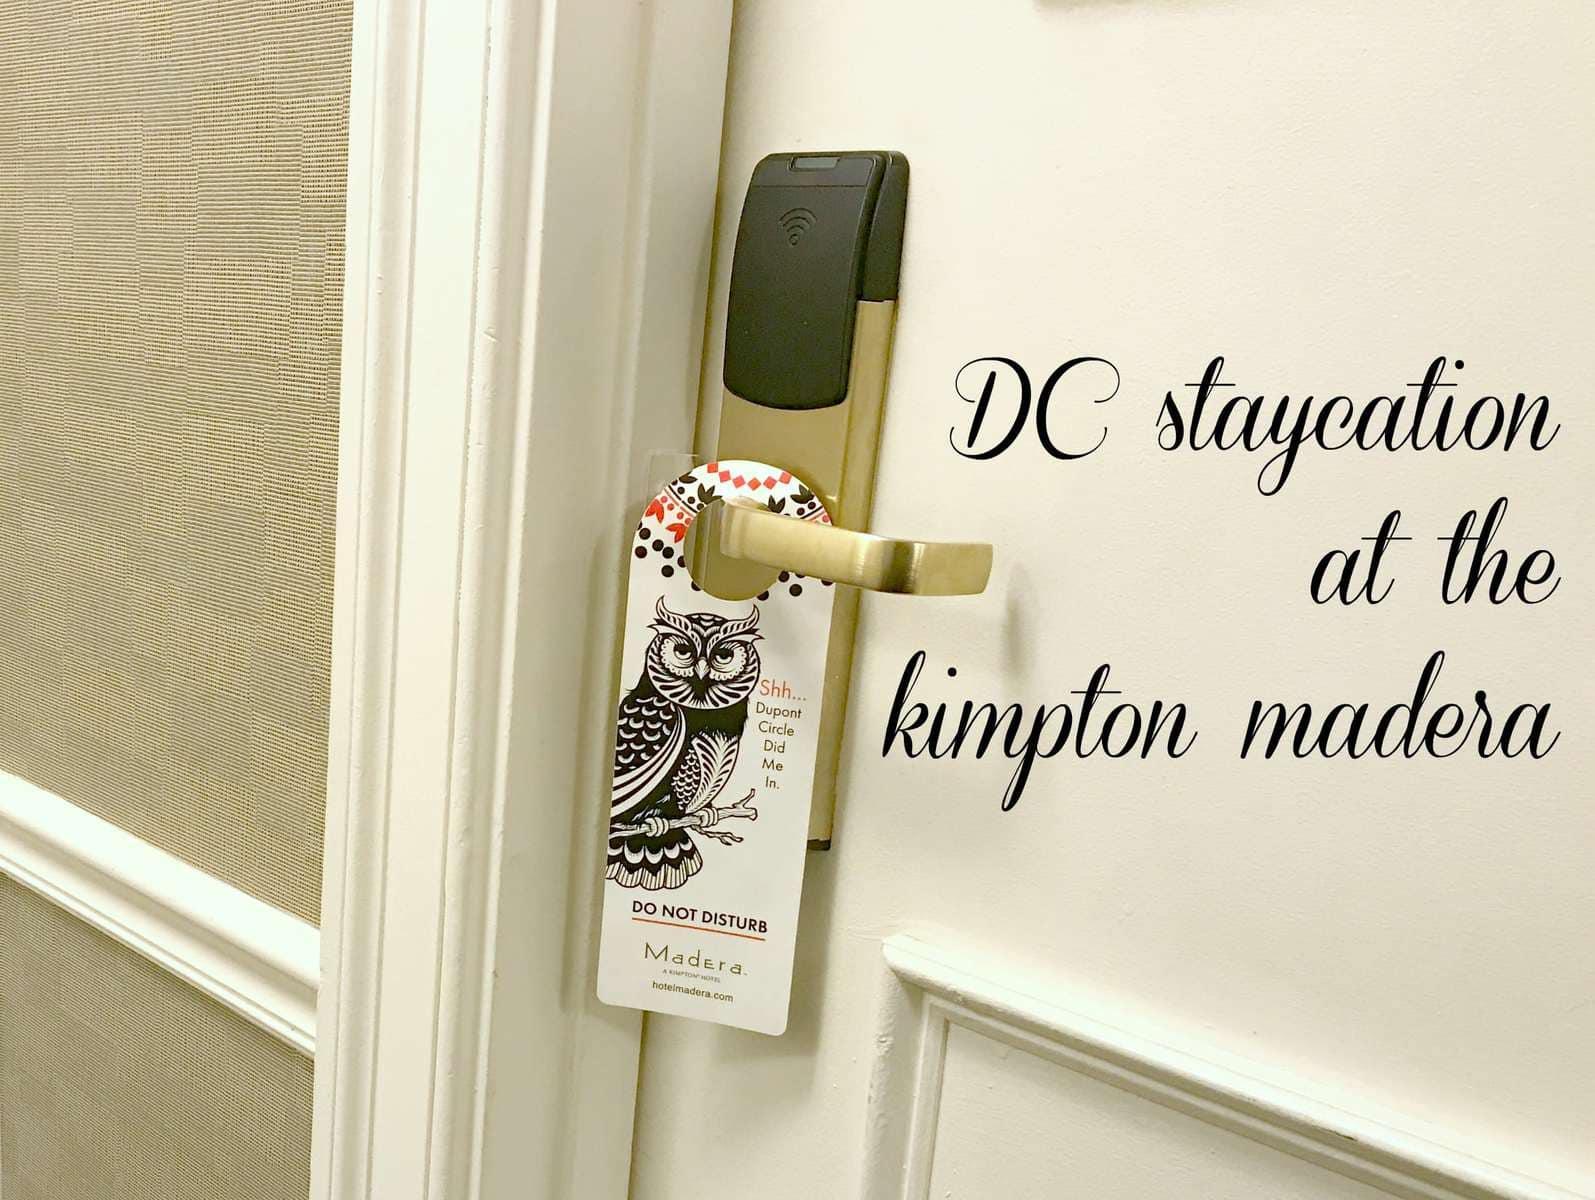 dc staycation kidc staycation kimpton maderampton madera